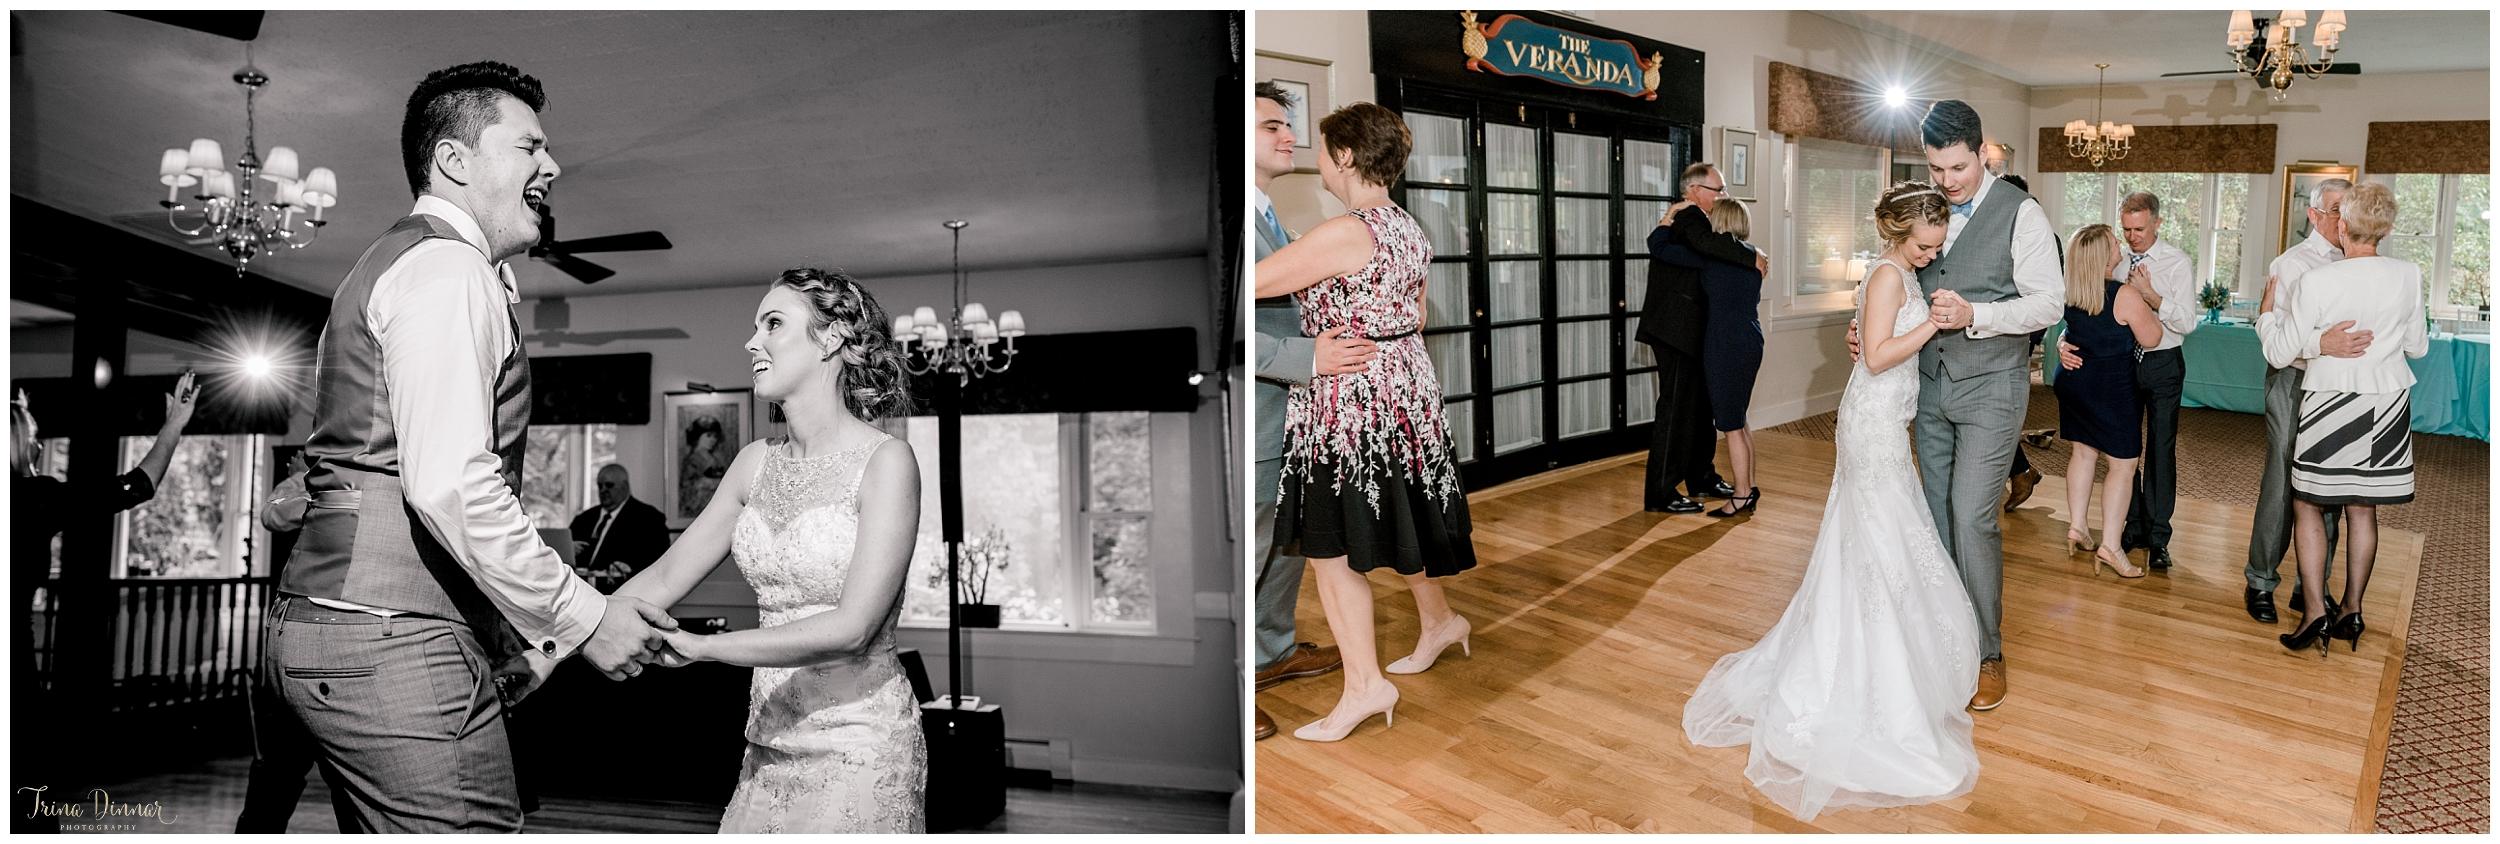 Cape Neddick wedding reception dancing